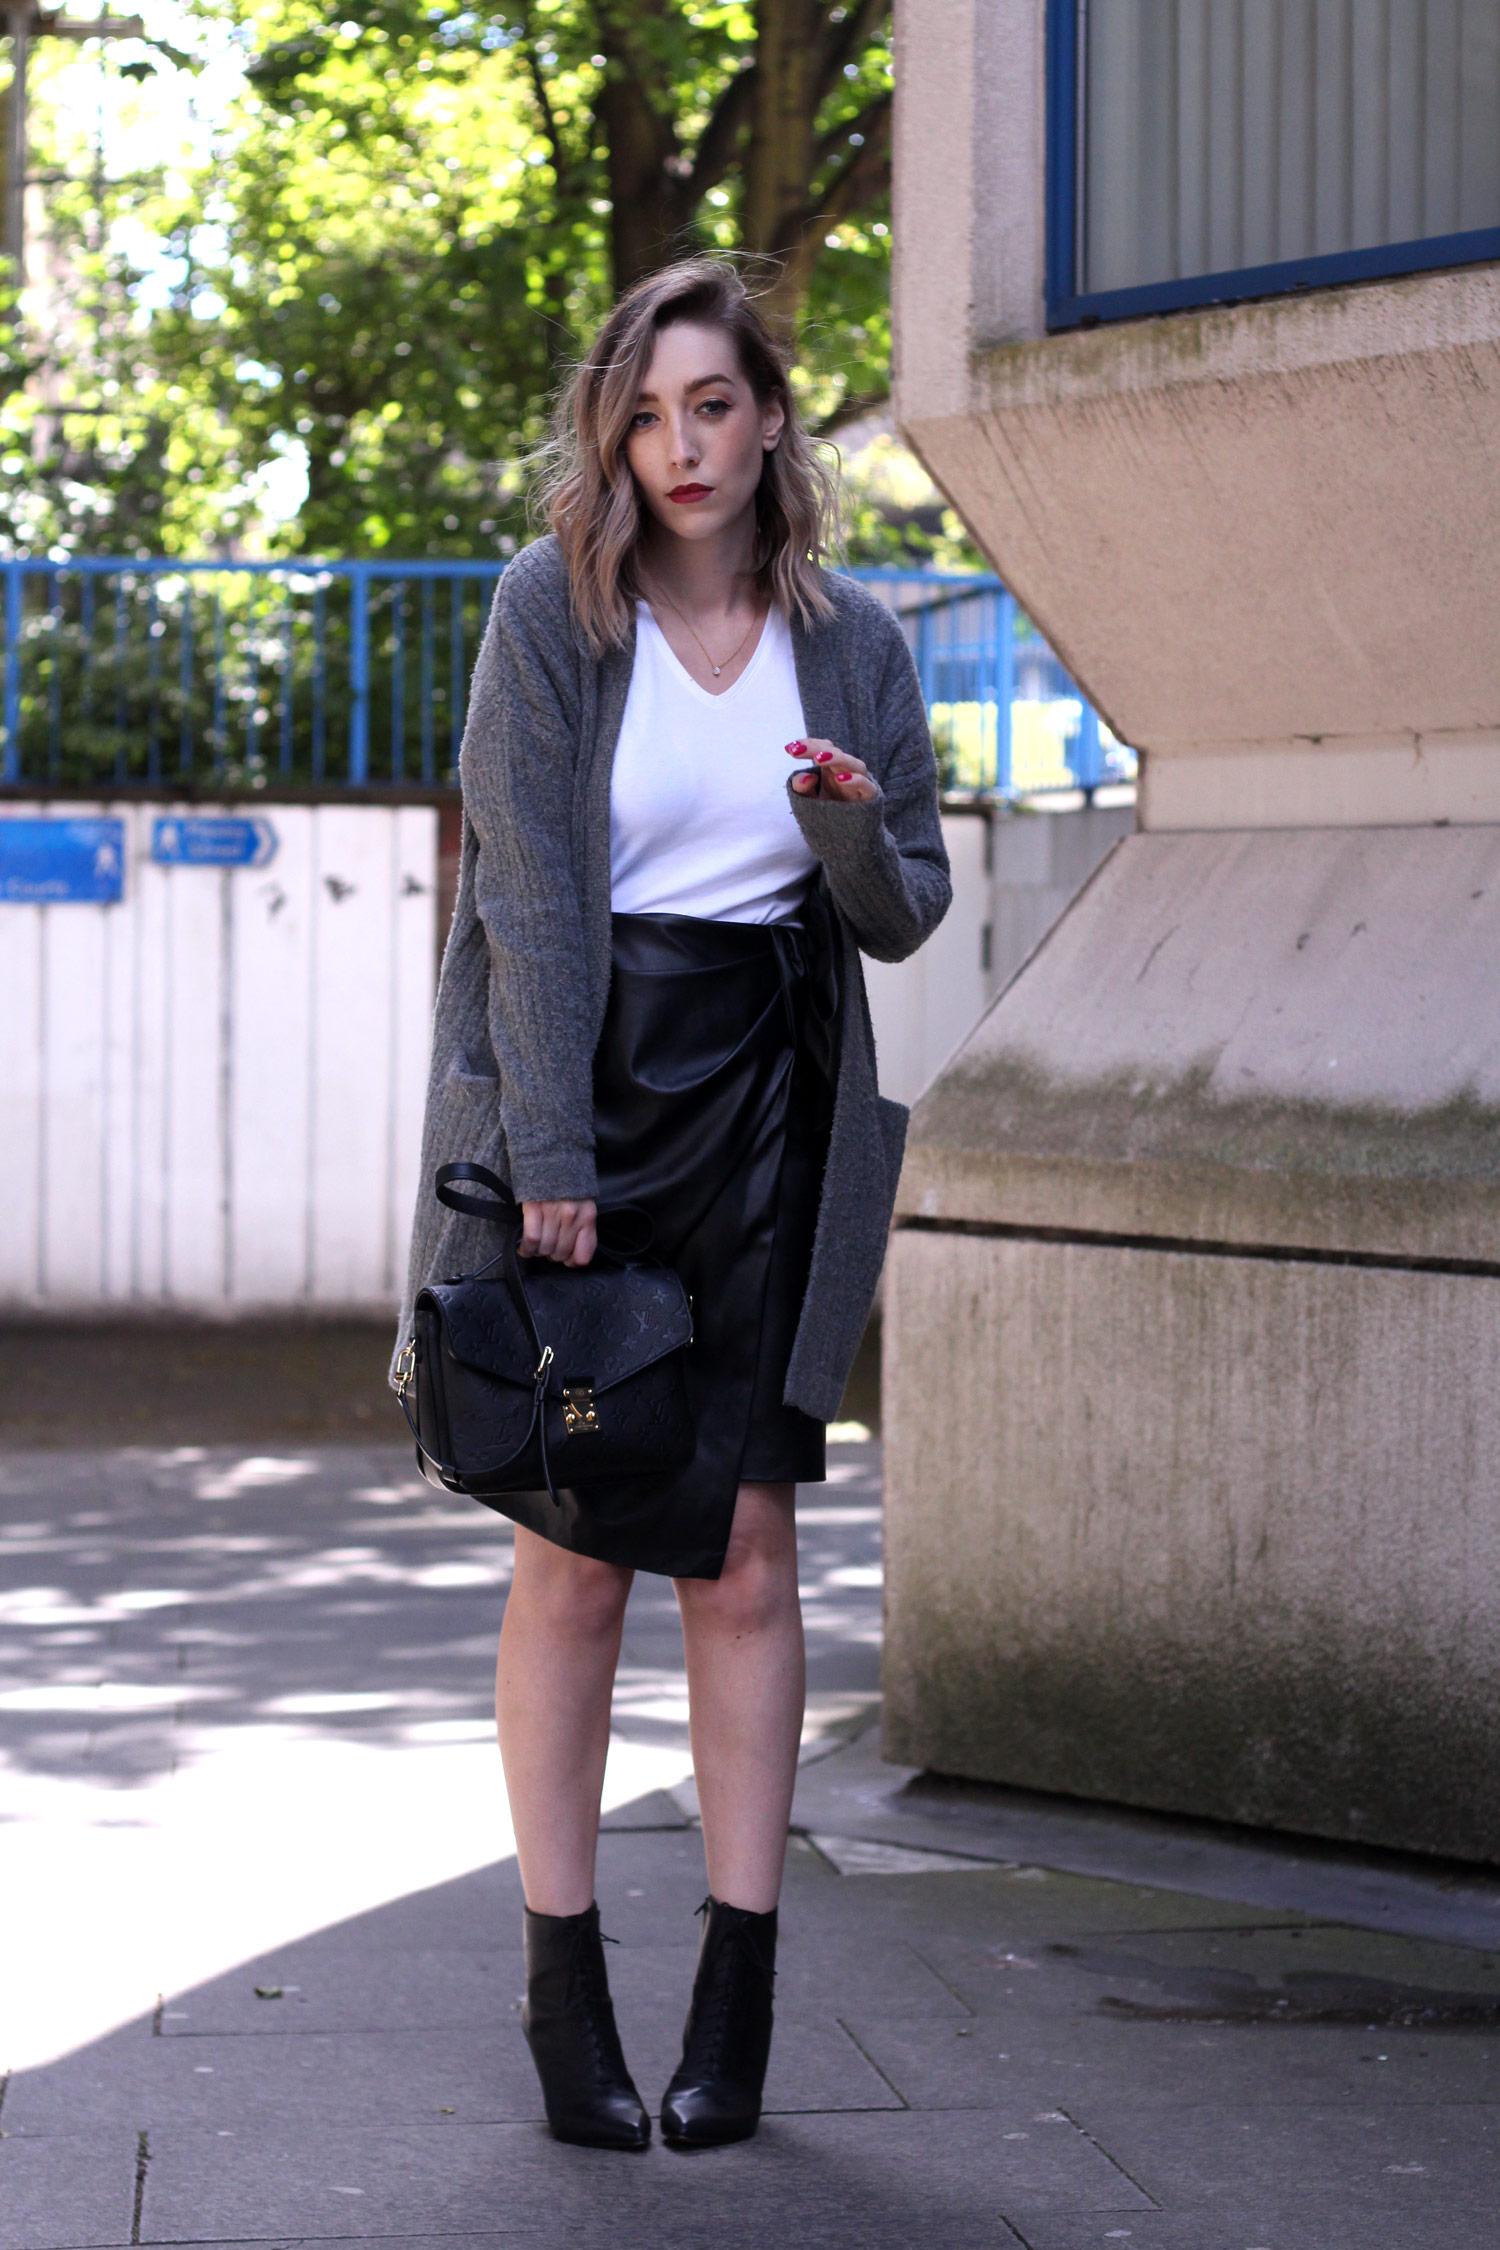 closet-london-leather-skirt-grey-cardgain-louis-vuitton-pochette-metis